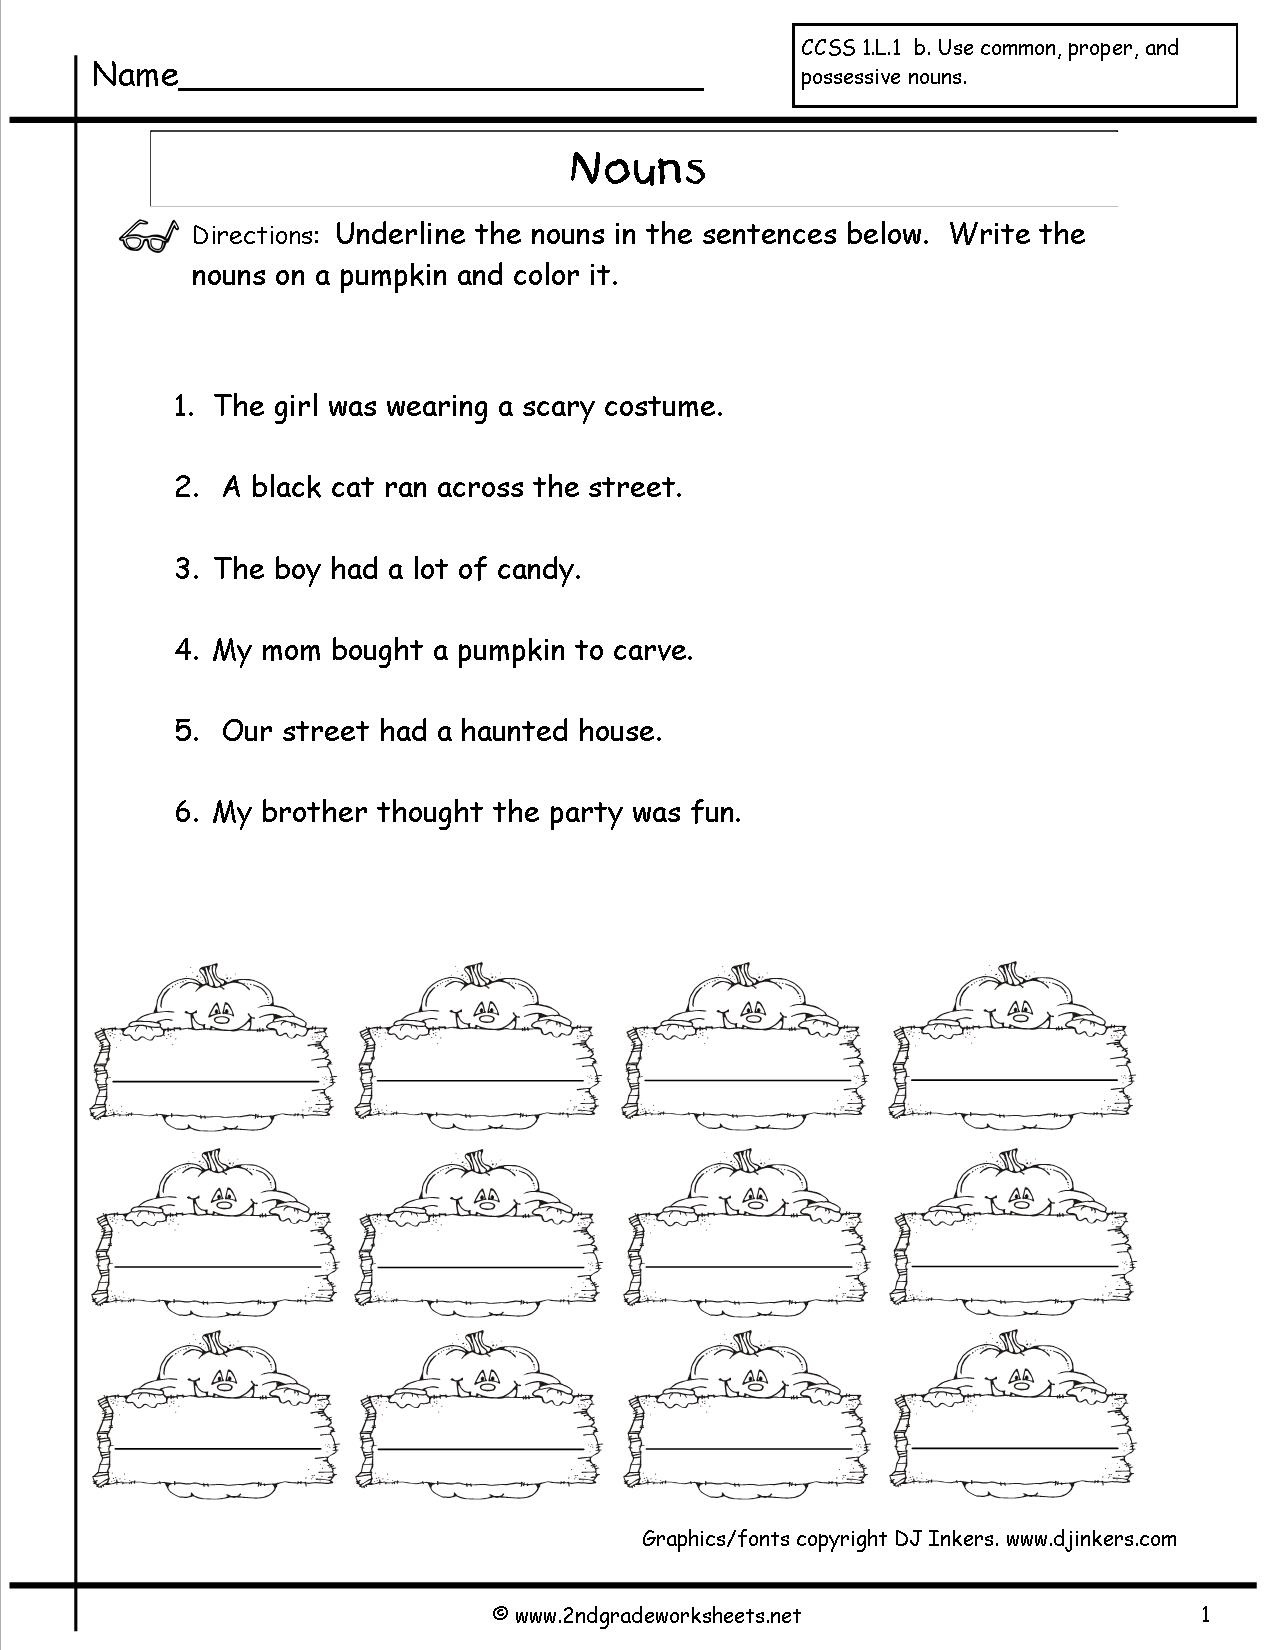 Nouns Worksheets And Printouts - Free Noun Printables